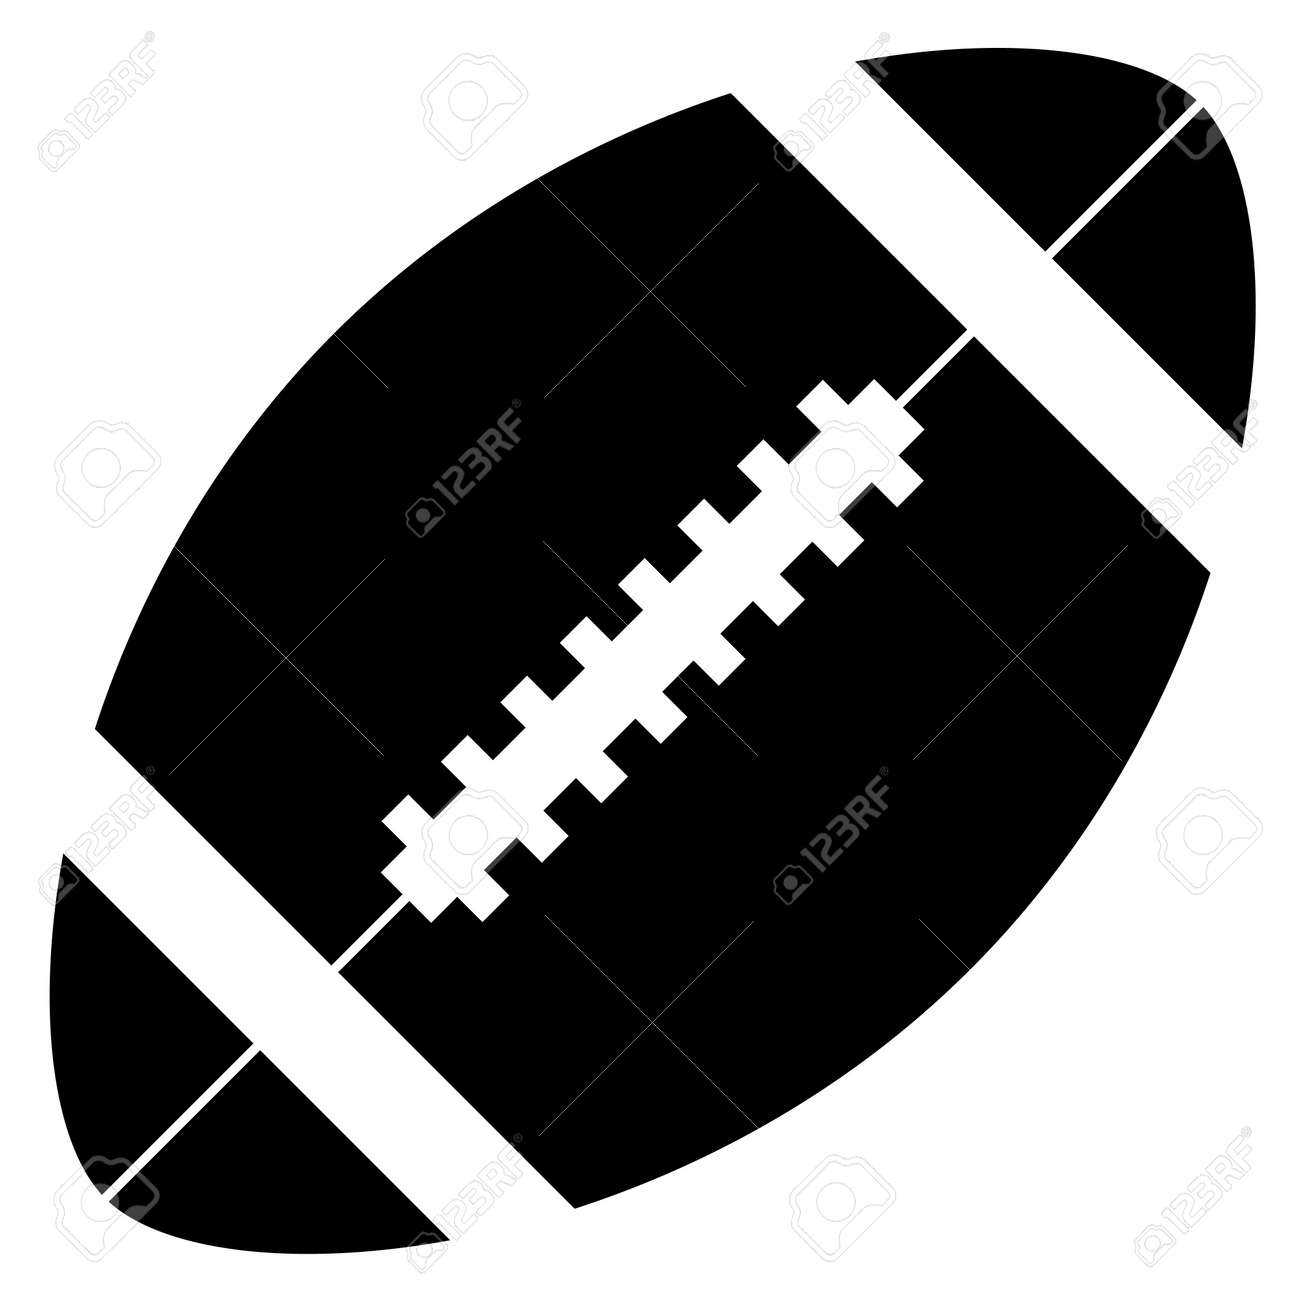 vector american football royalty free cliparts vectors and stock